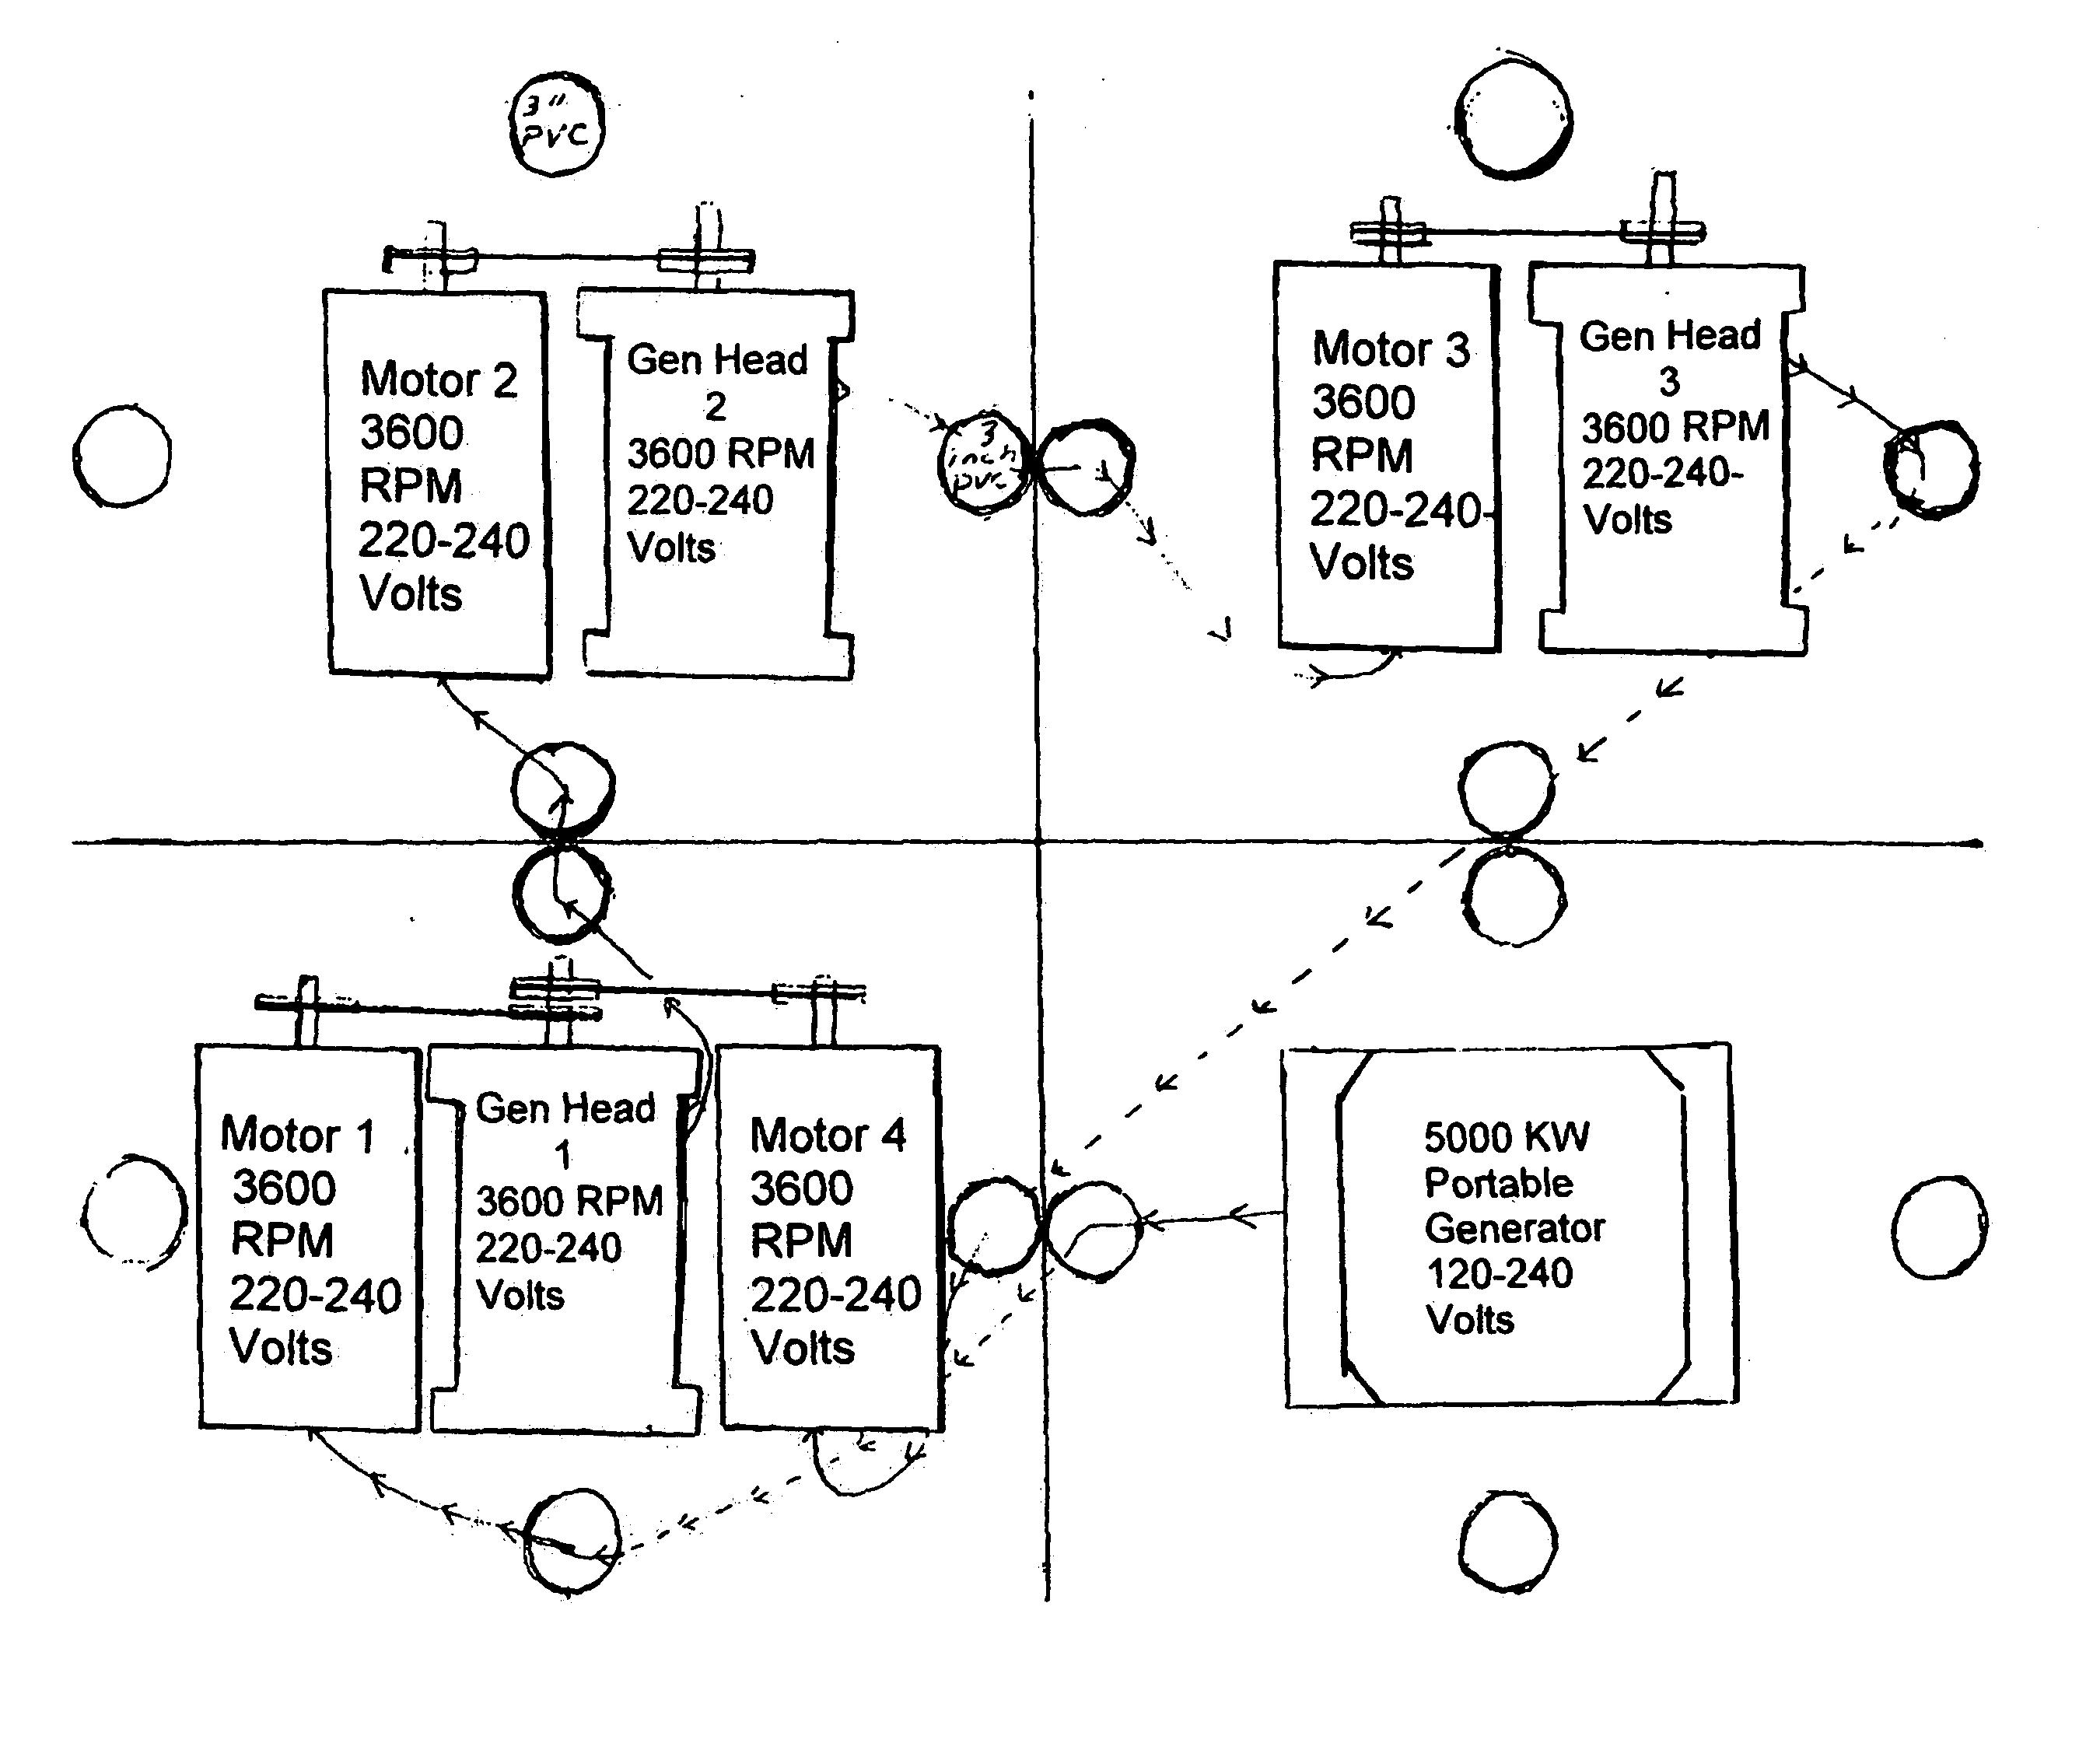 Cool Patent Us20100033047 Flavell Home Electric Generation System Wiring Cloud Lukepaidewilluminateatxorg